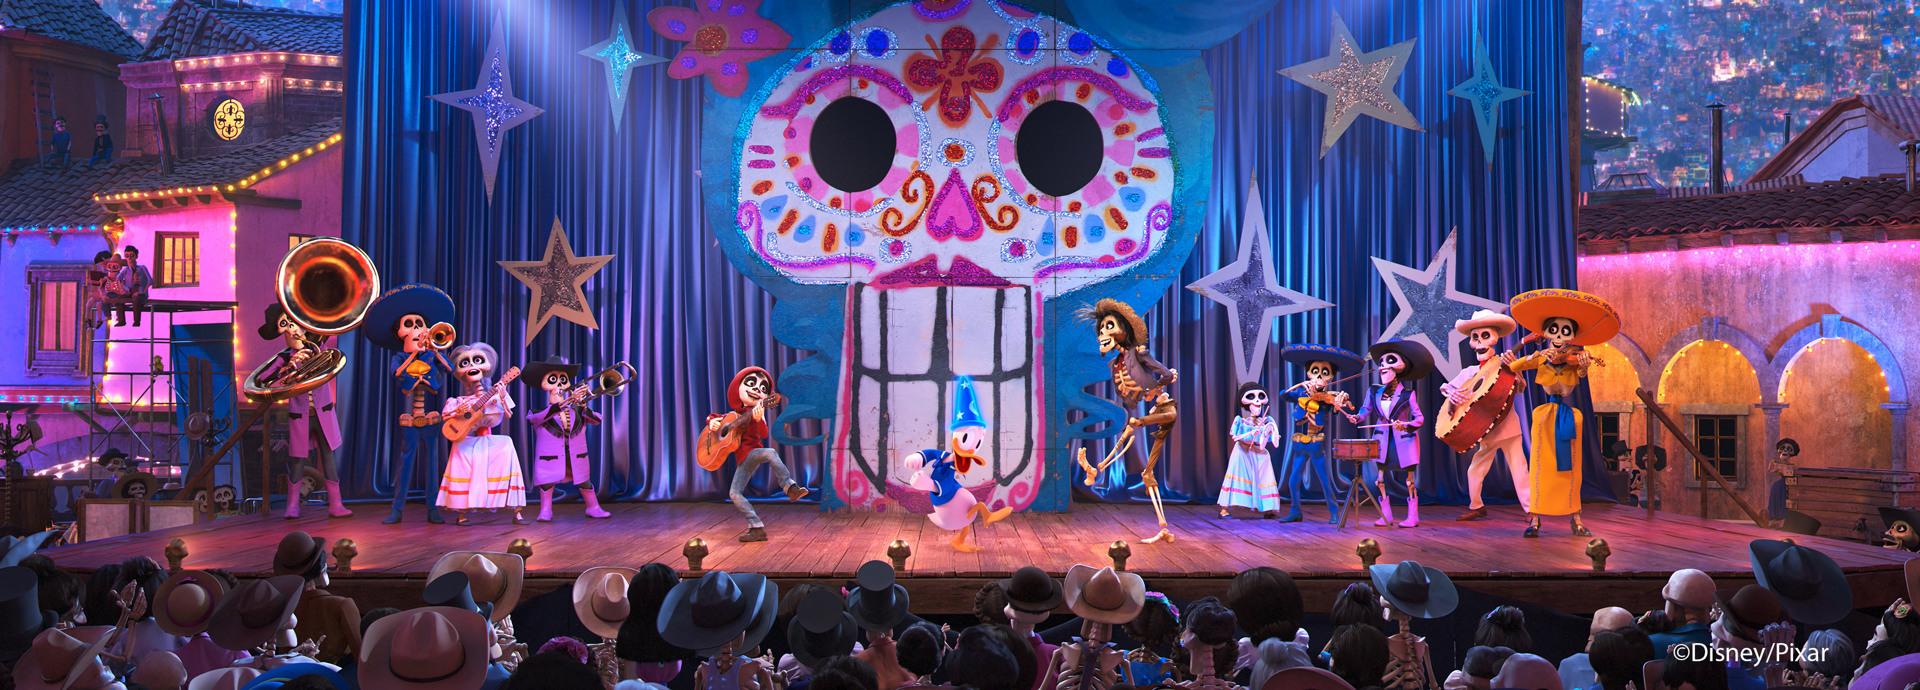 2018 - Mickey et son orchestre Philharmagique  - Pagina 3 Yybvrk10